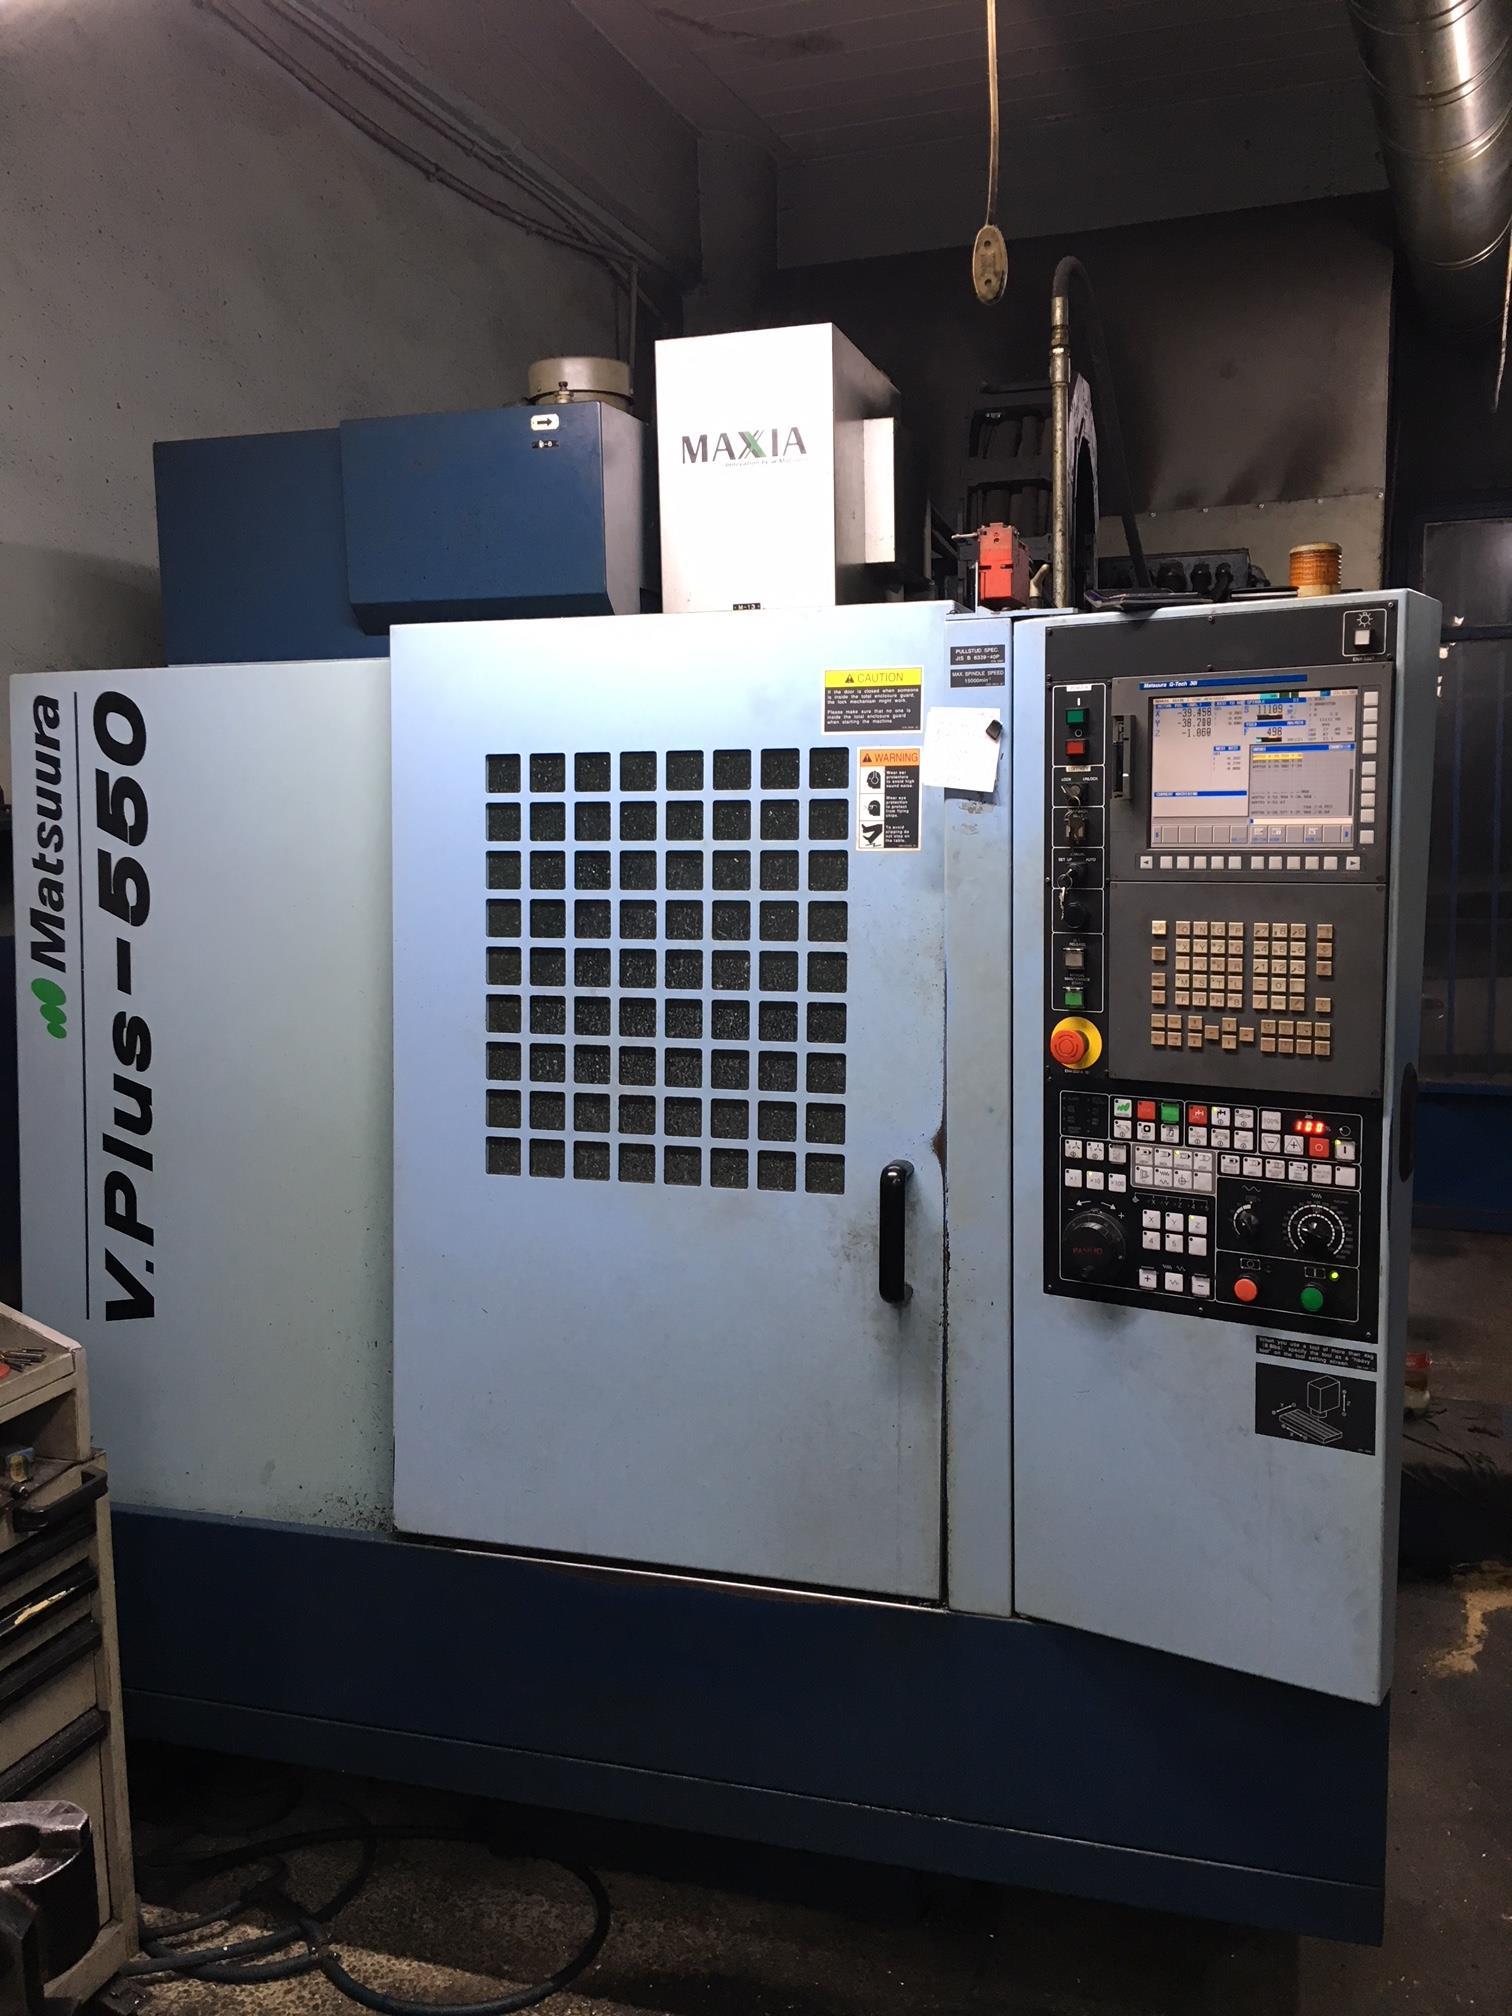 Matsuura V Plus 550 Machining Center Vertical Exapro